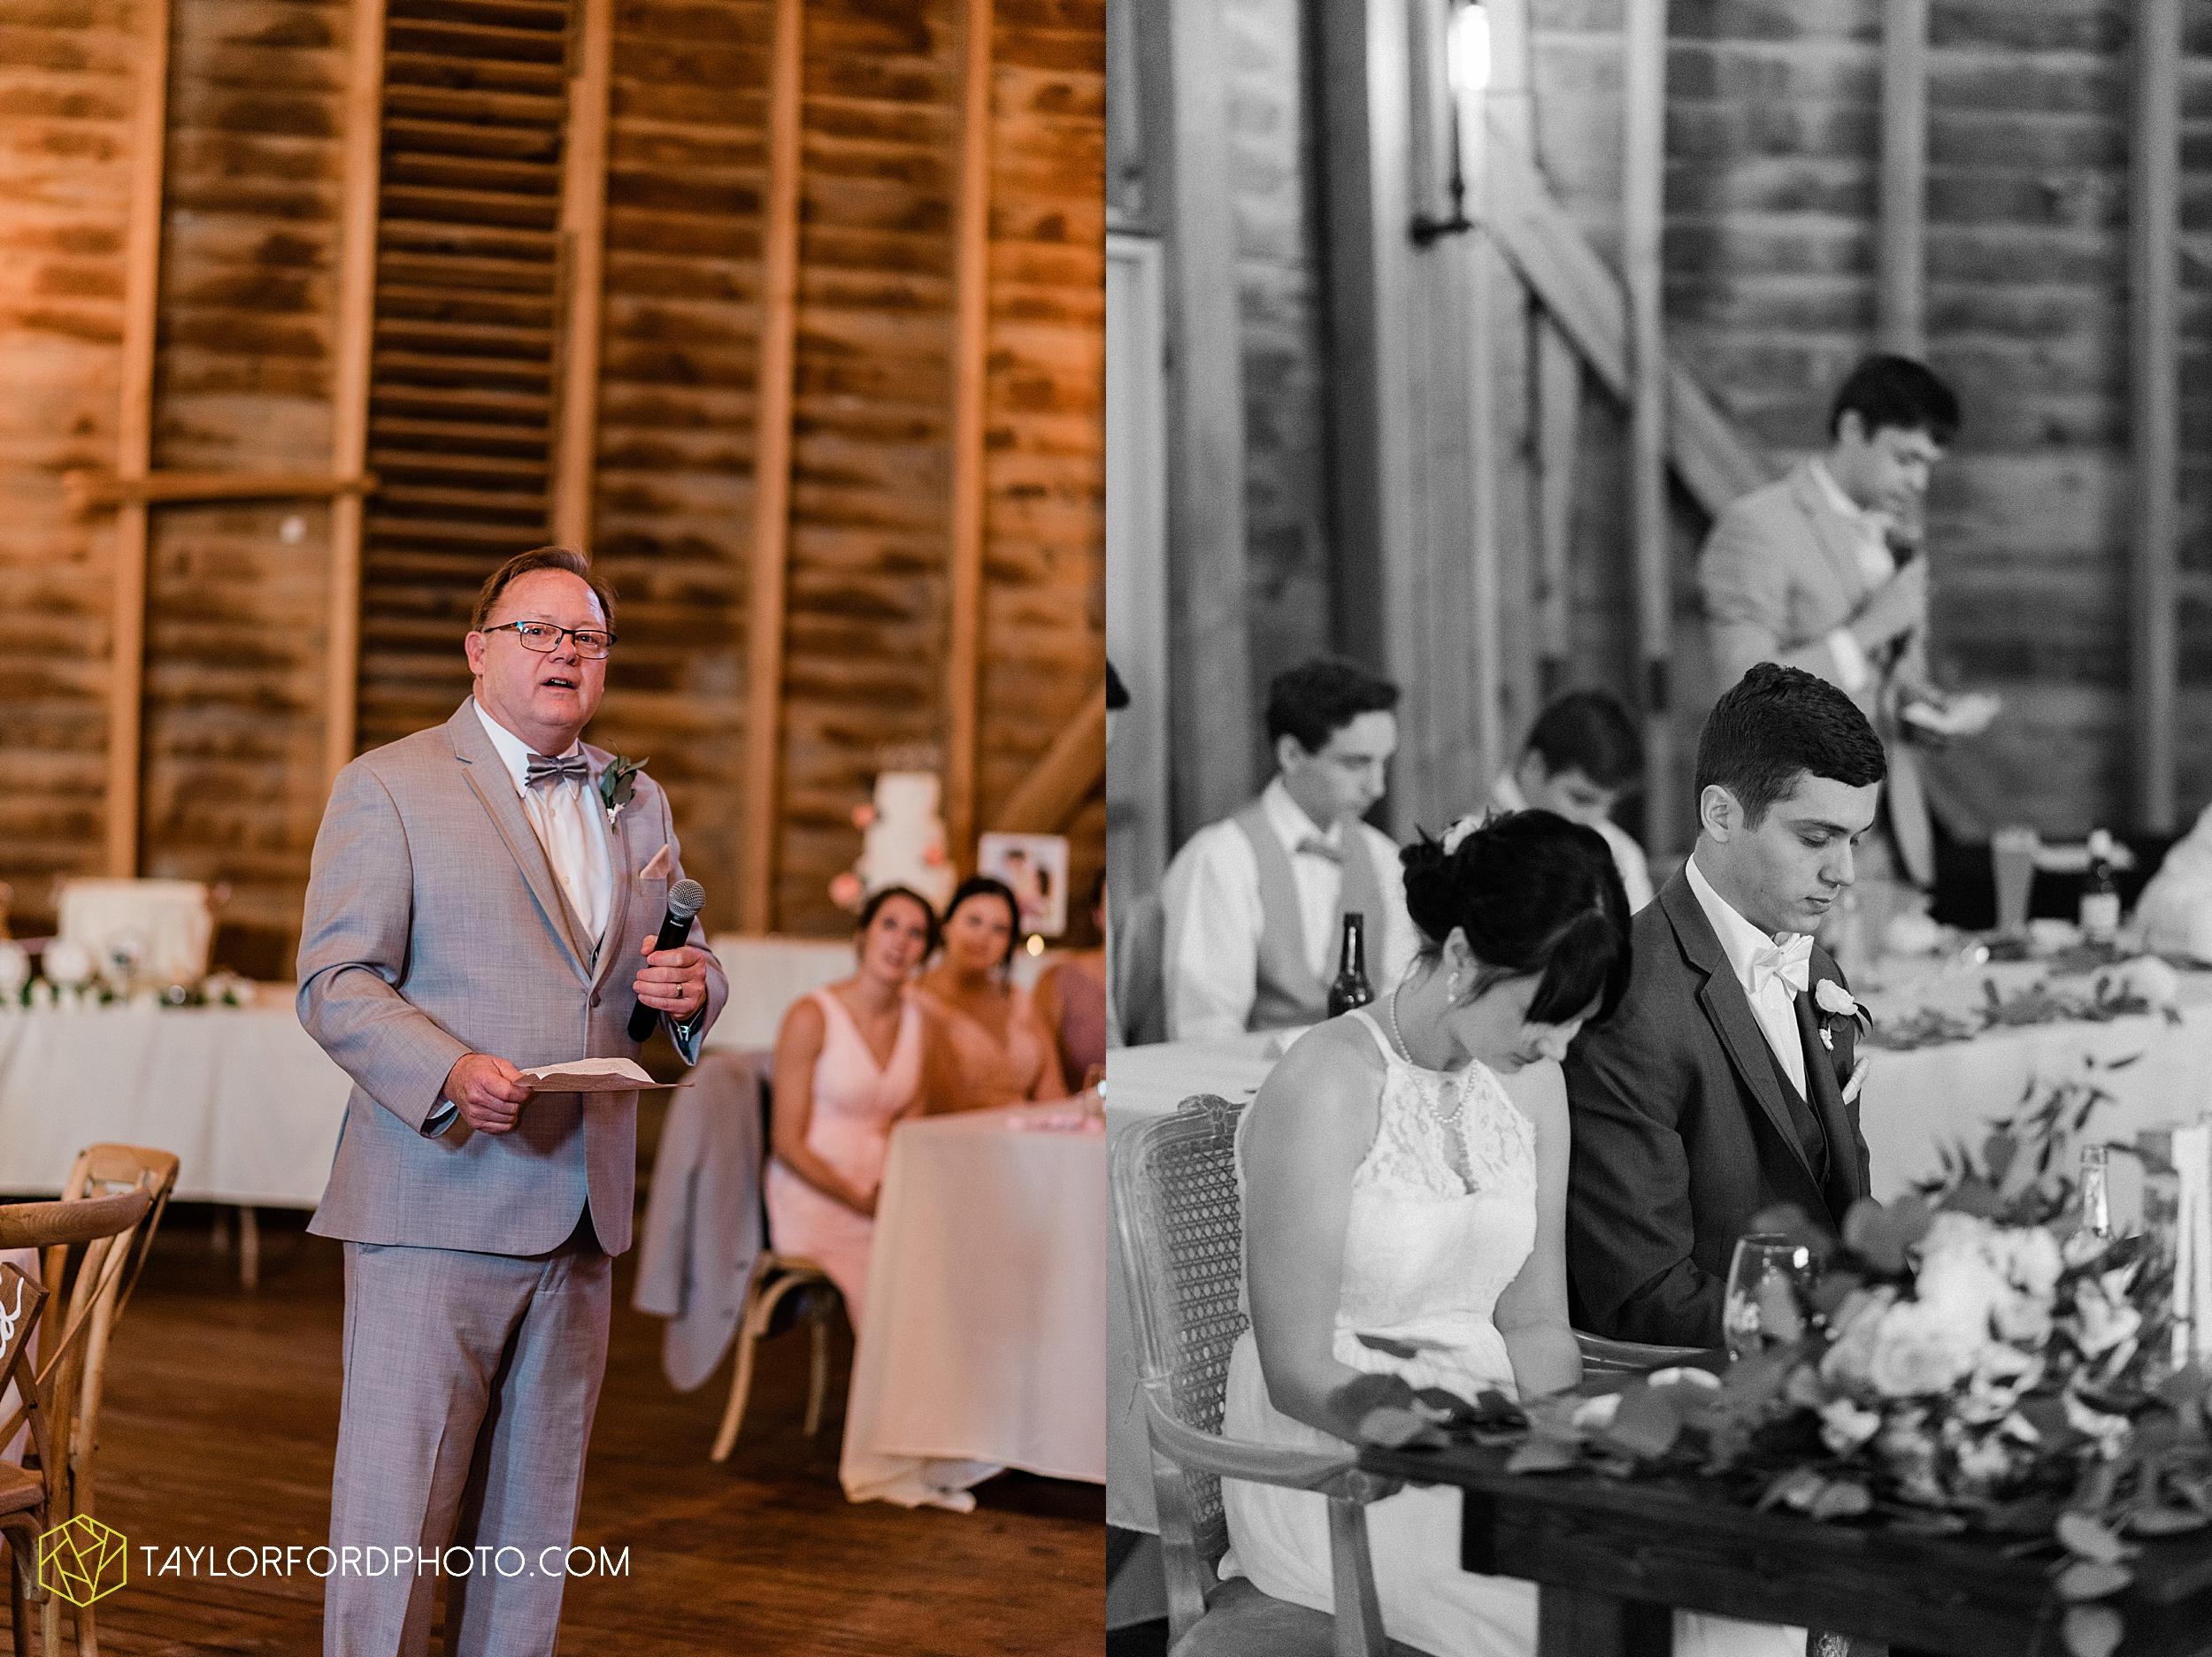 marissa-nicole-nick-daeger-orrmont-estate-farm-wedding-piqua-dayton-troy-ohio-fall-photographer-taylor-ford-photography_1557.jpg